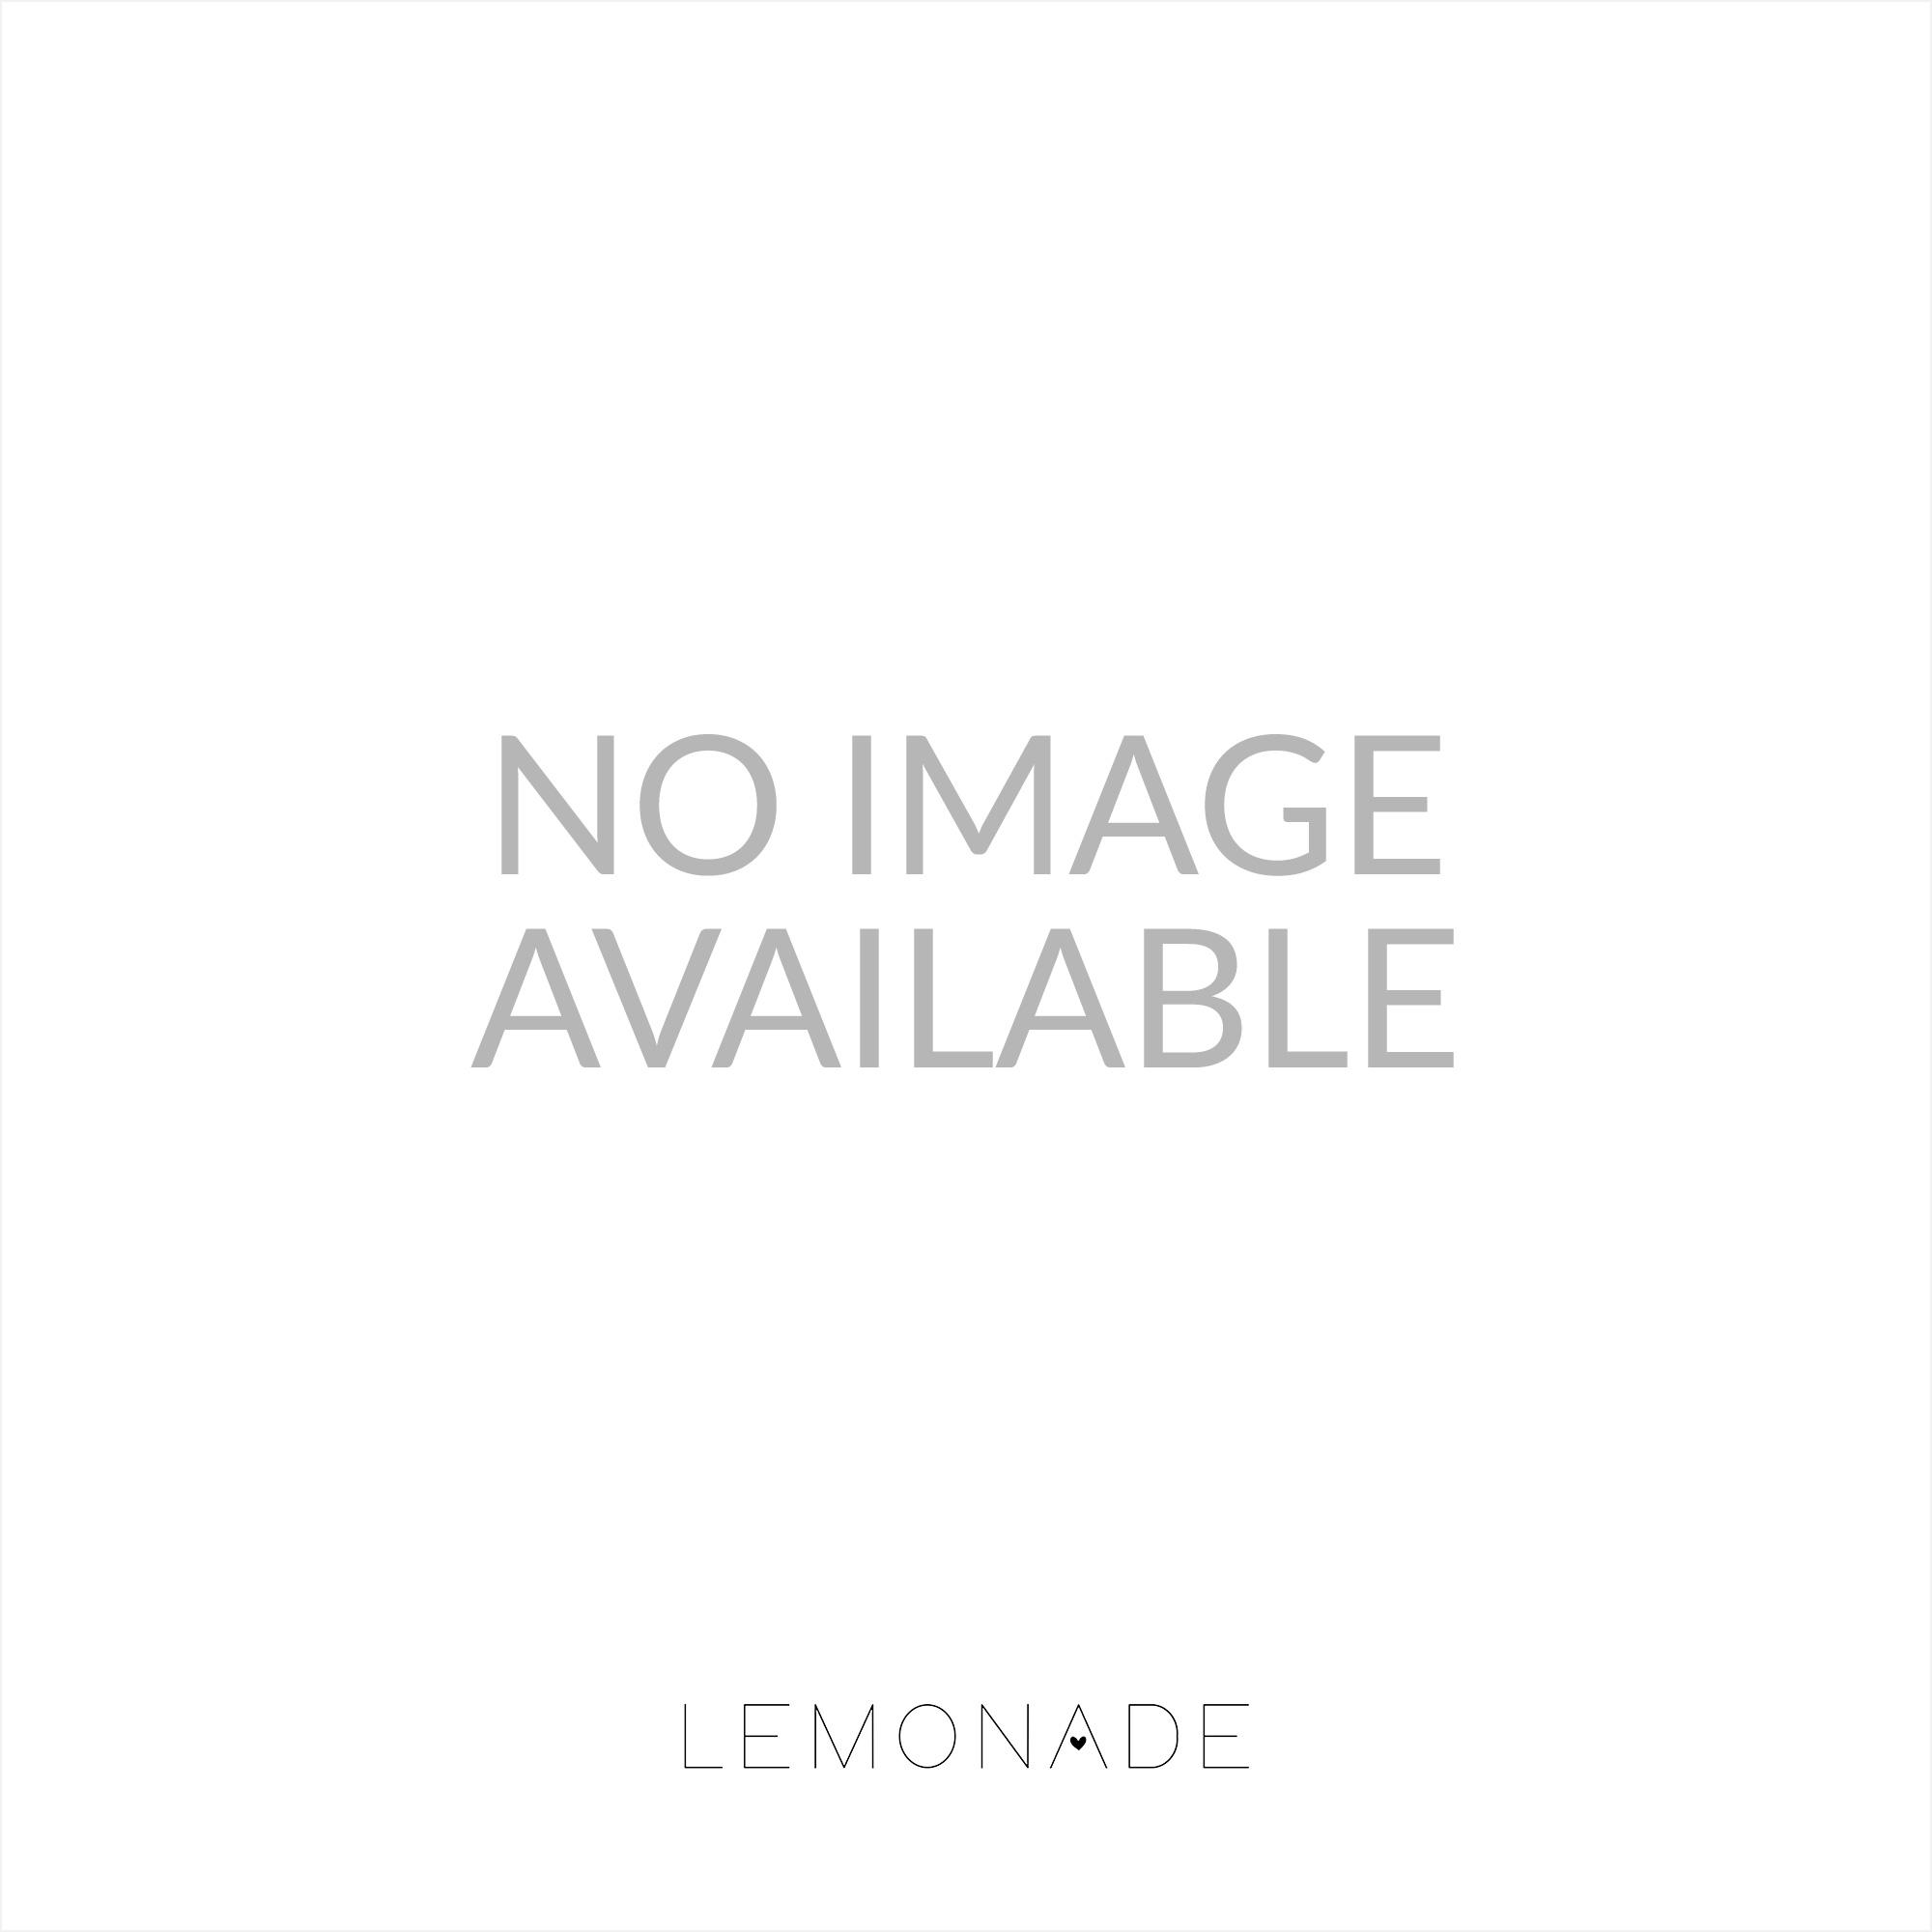 Lemonade Swarovski Crystal Jelly bow Flip Flop Silver - SHOP SHOES ... 9a0a585c8b